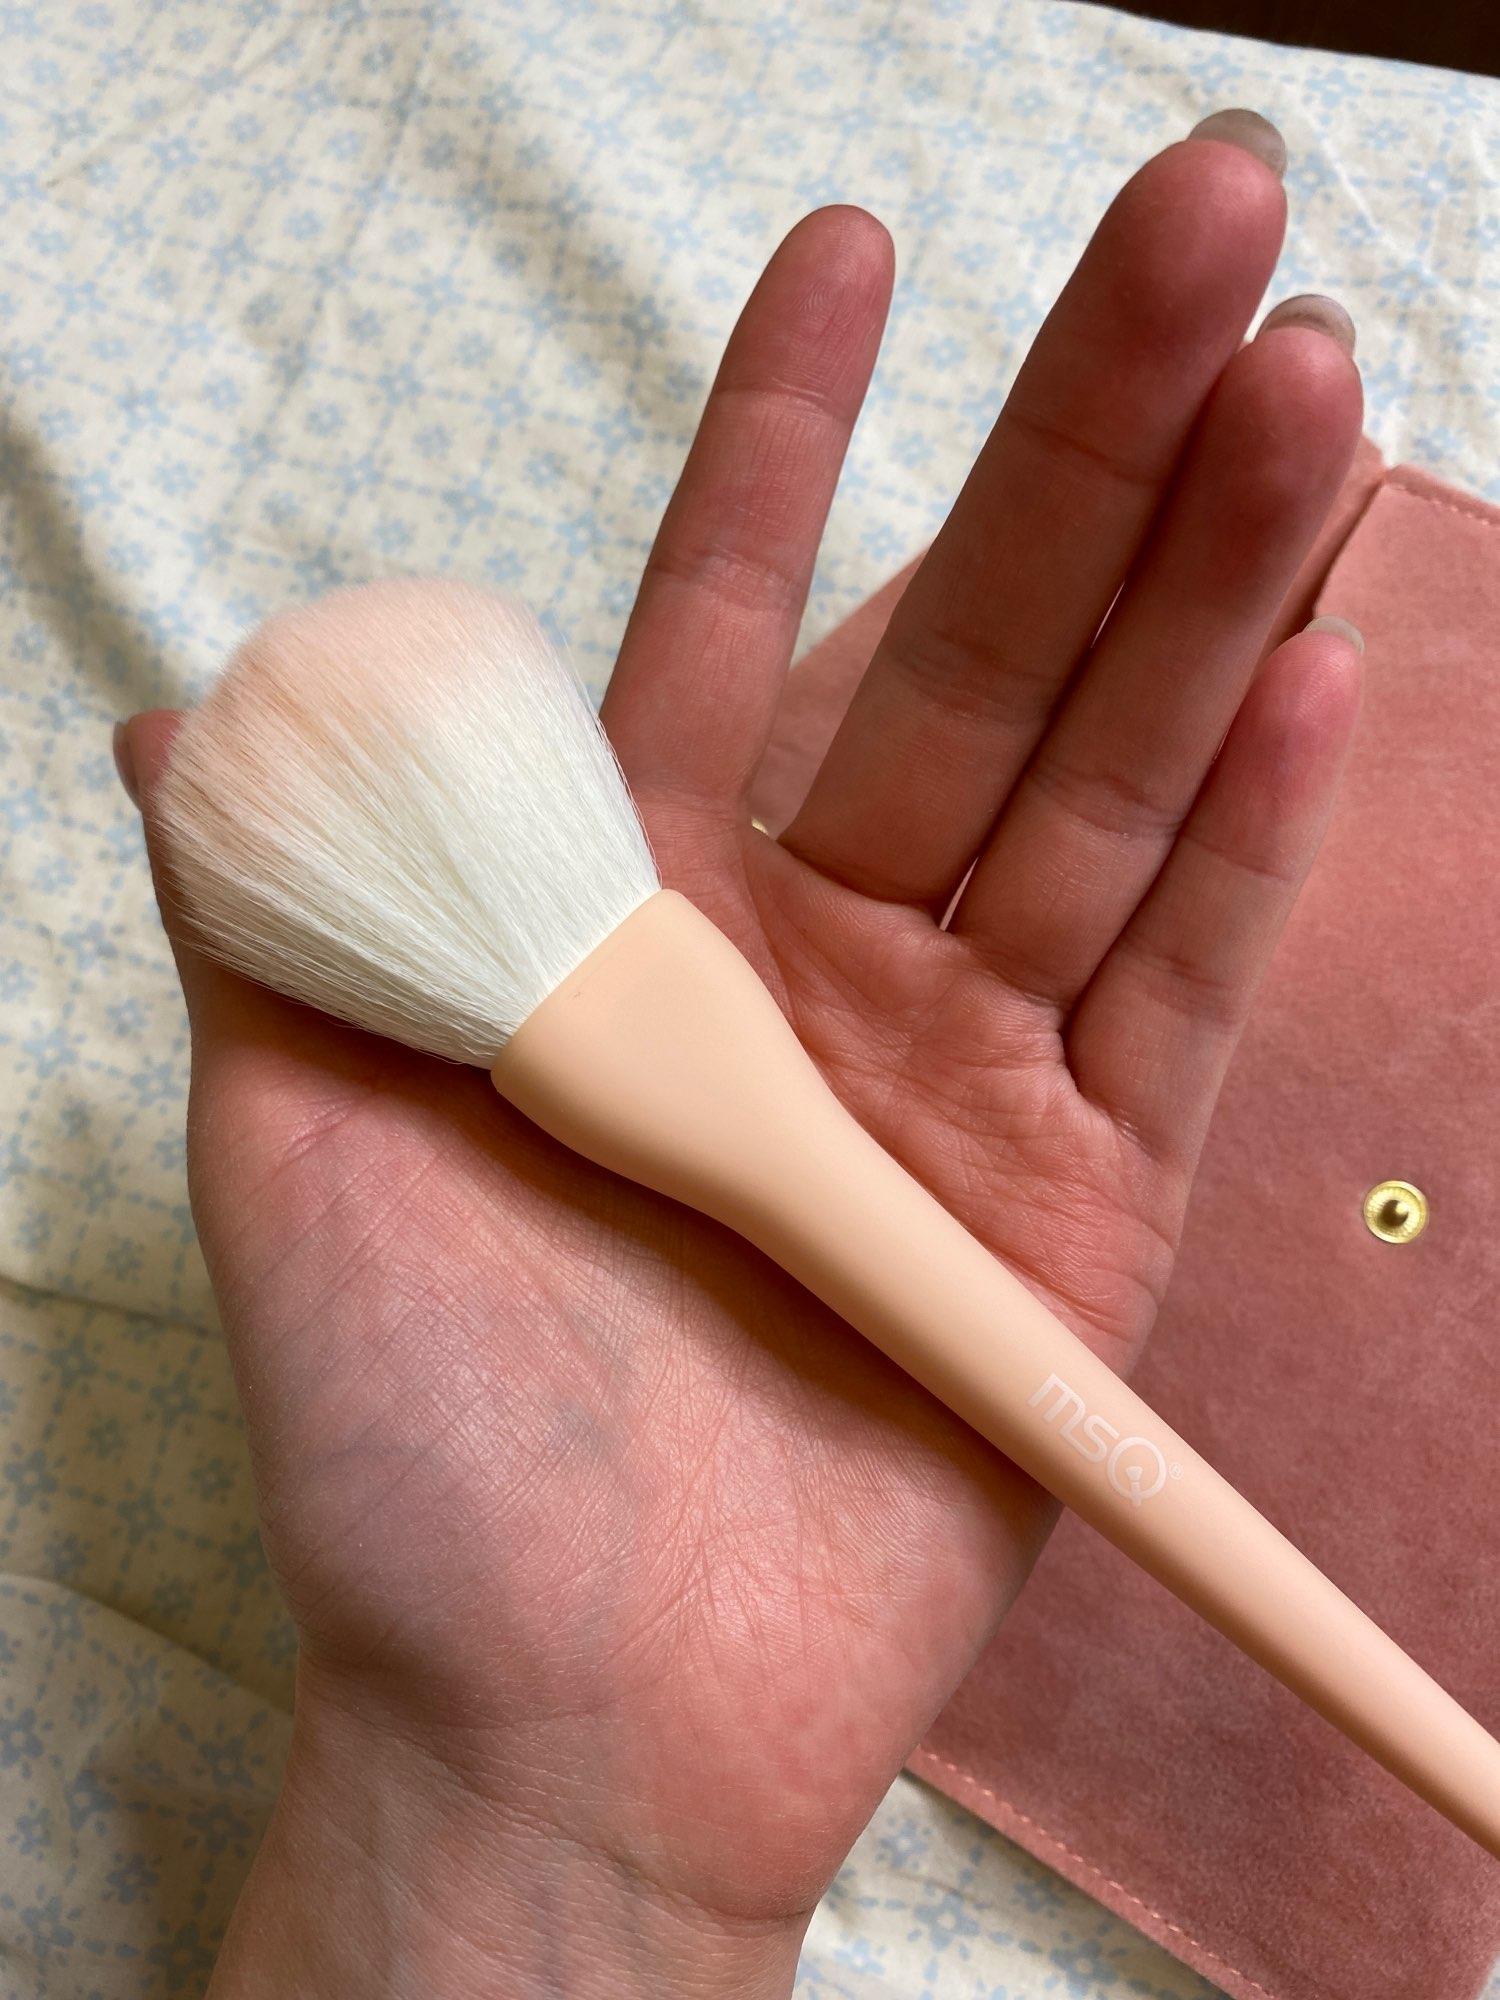 8PCS Makeup Brushes Sets Powder Foundation Blusher Eyeshadow Brush Candy Cosmetic Colorful Make Up NO MSQ LOGO With Bag reviews №1 223977